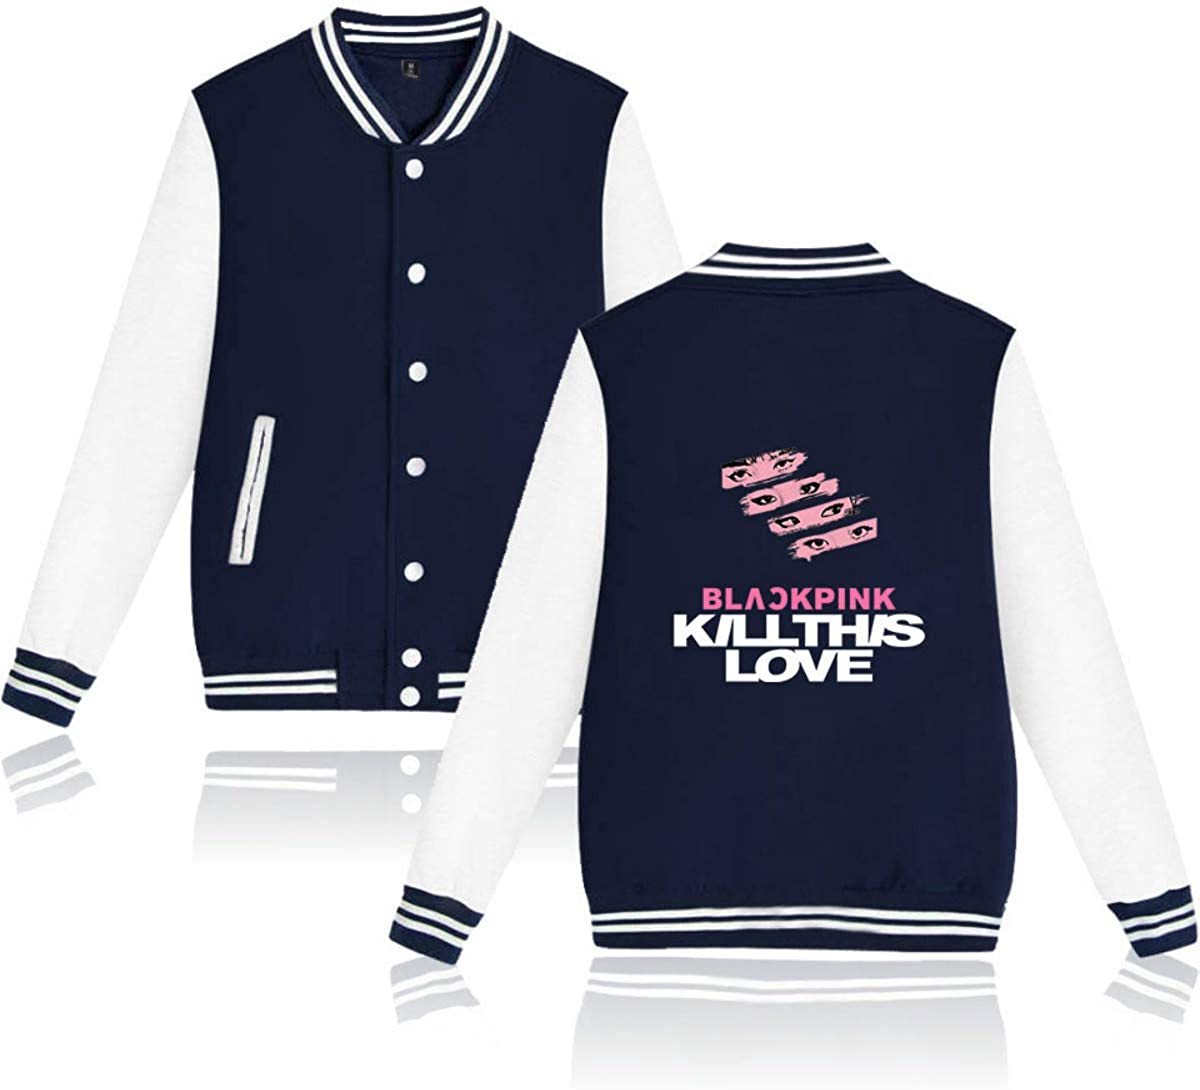 Forever Younger Kpop Blackpink Bedruckte Baseballmäntel Jacken Mäntel Outwear Langarm Hoodie Sweatshirt Lisa Rose Jennie JISOO 3